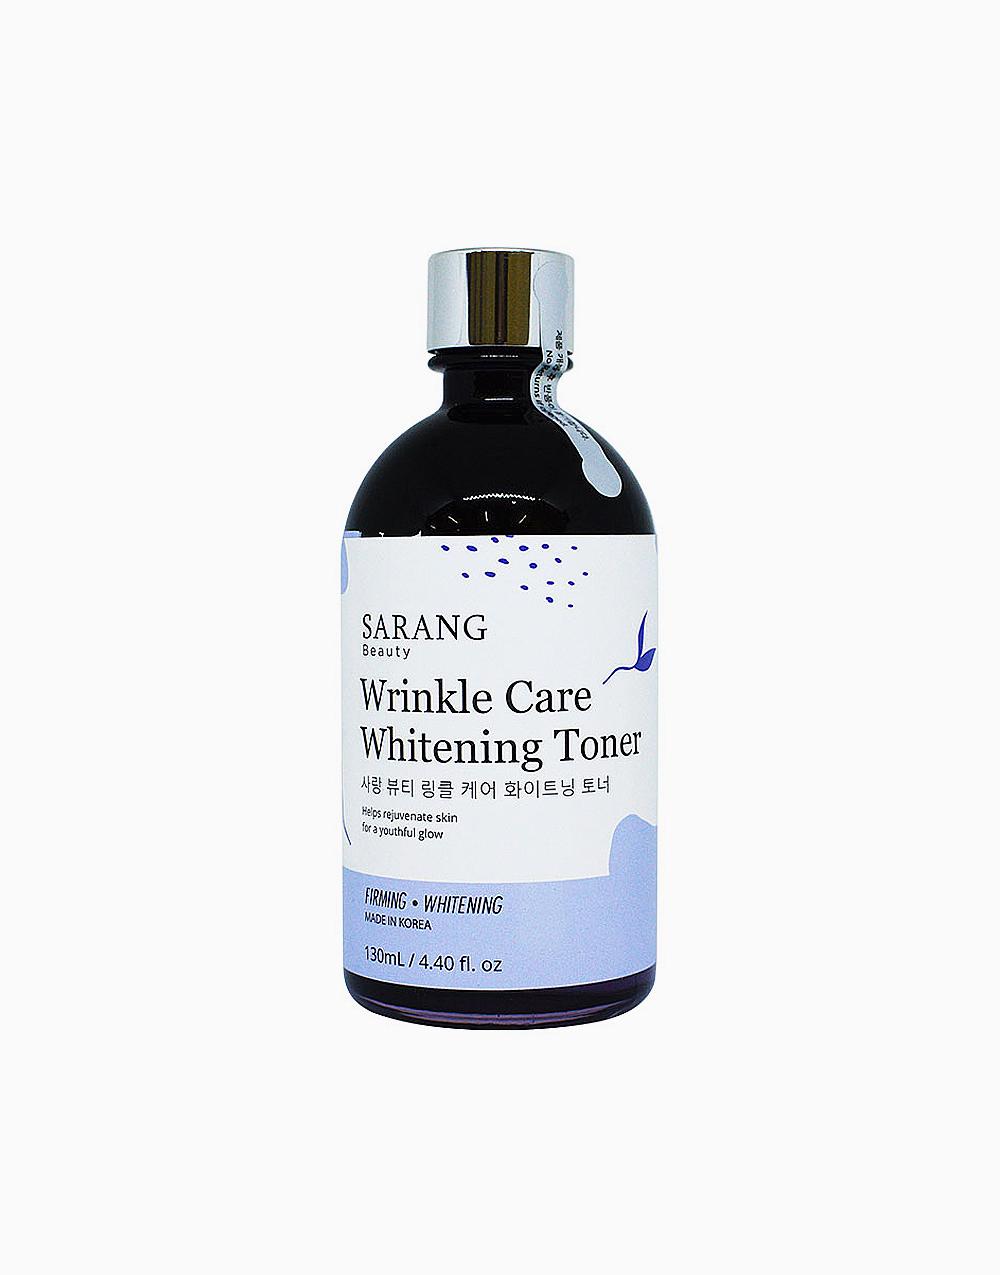 Wrinkle Care Whitening Toner (130ml) by Sarang Beauty